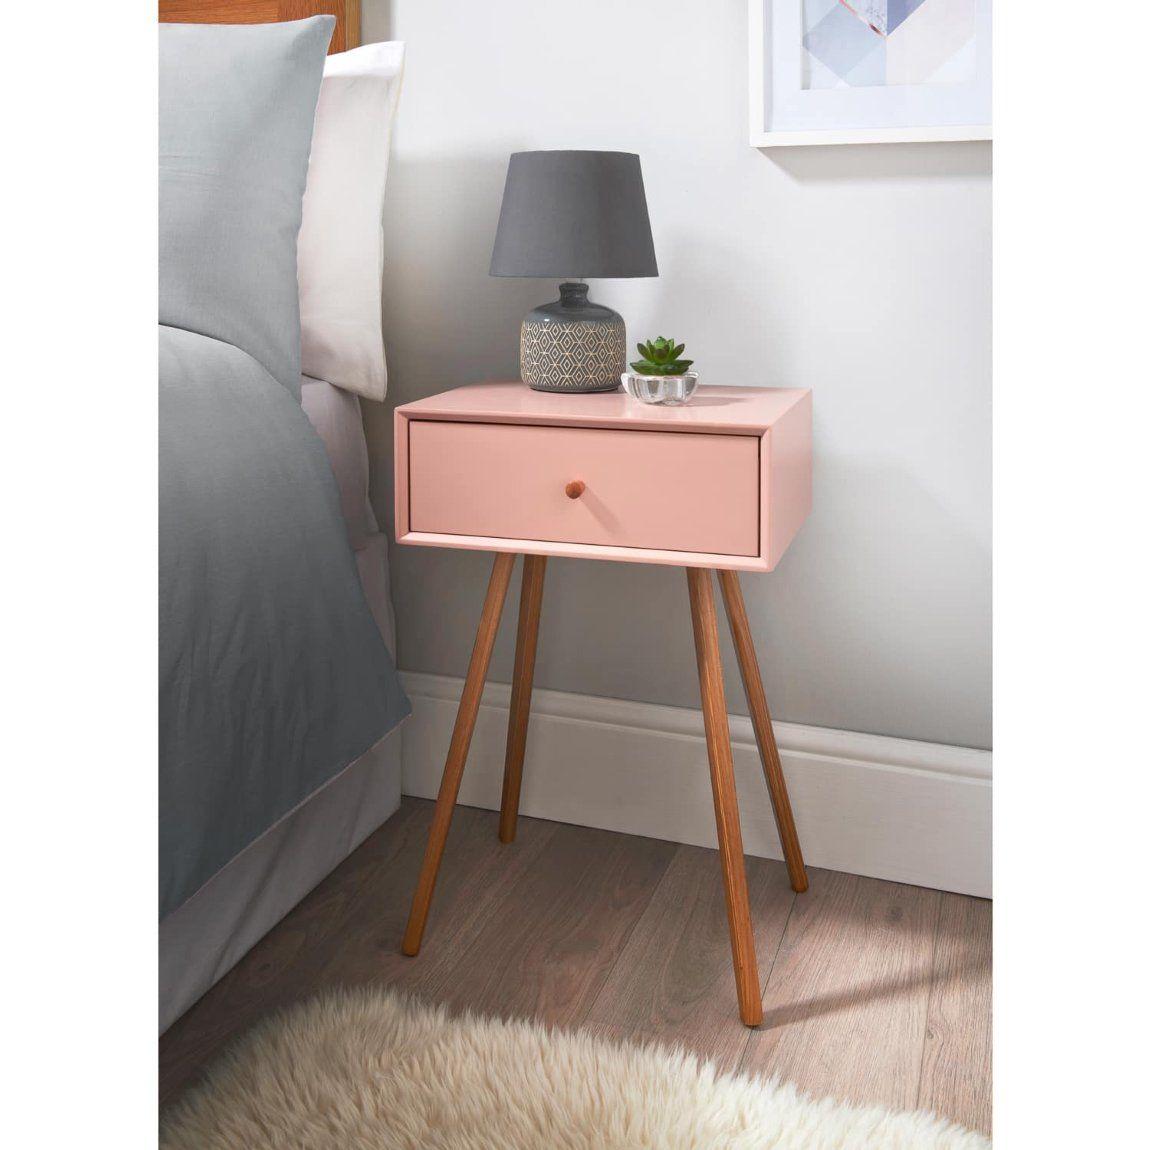 20 B M Furniture Cheap Bedside Tables Blush Bedroom